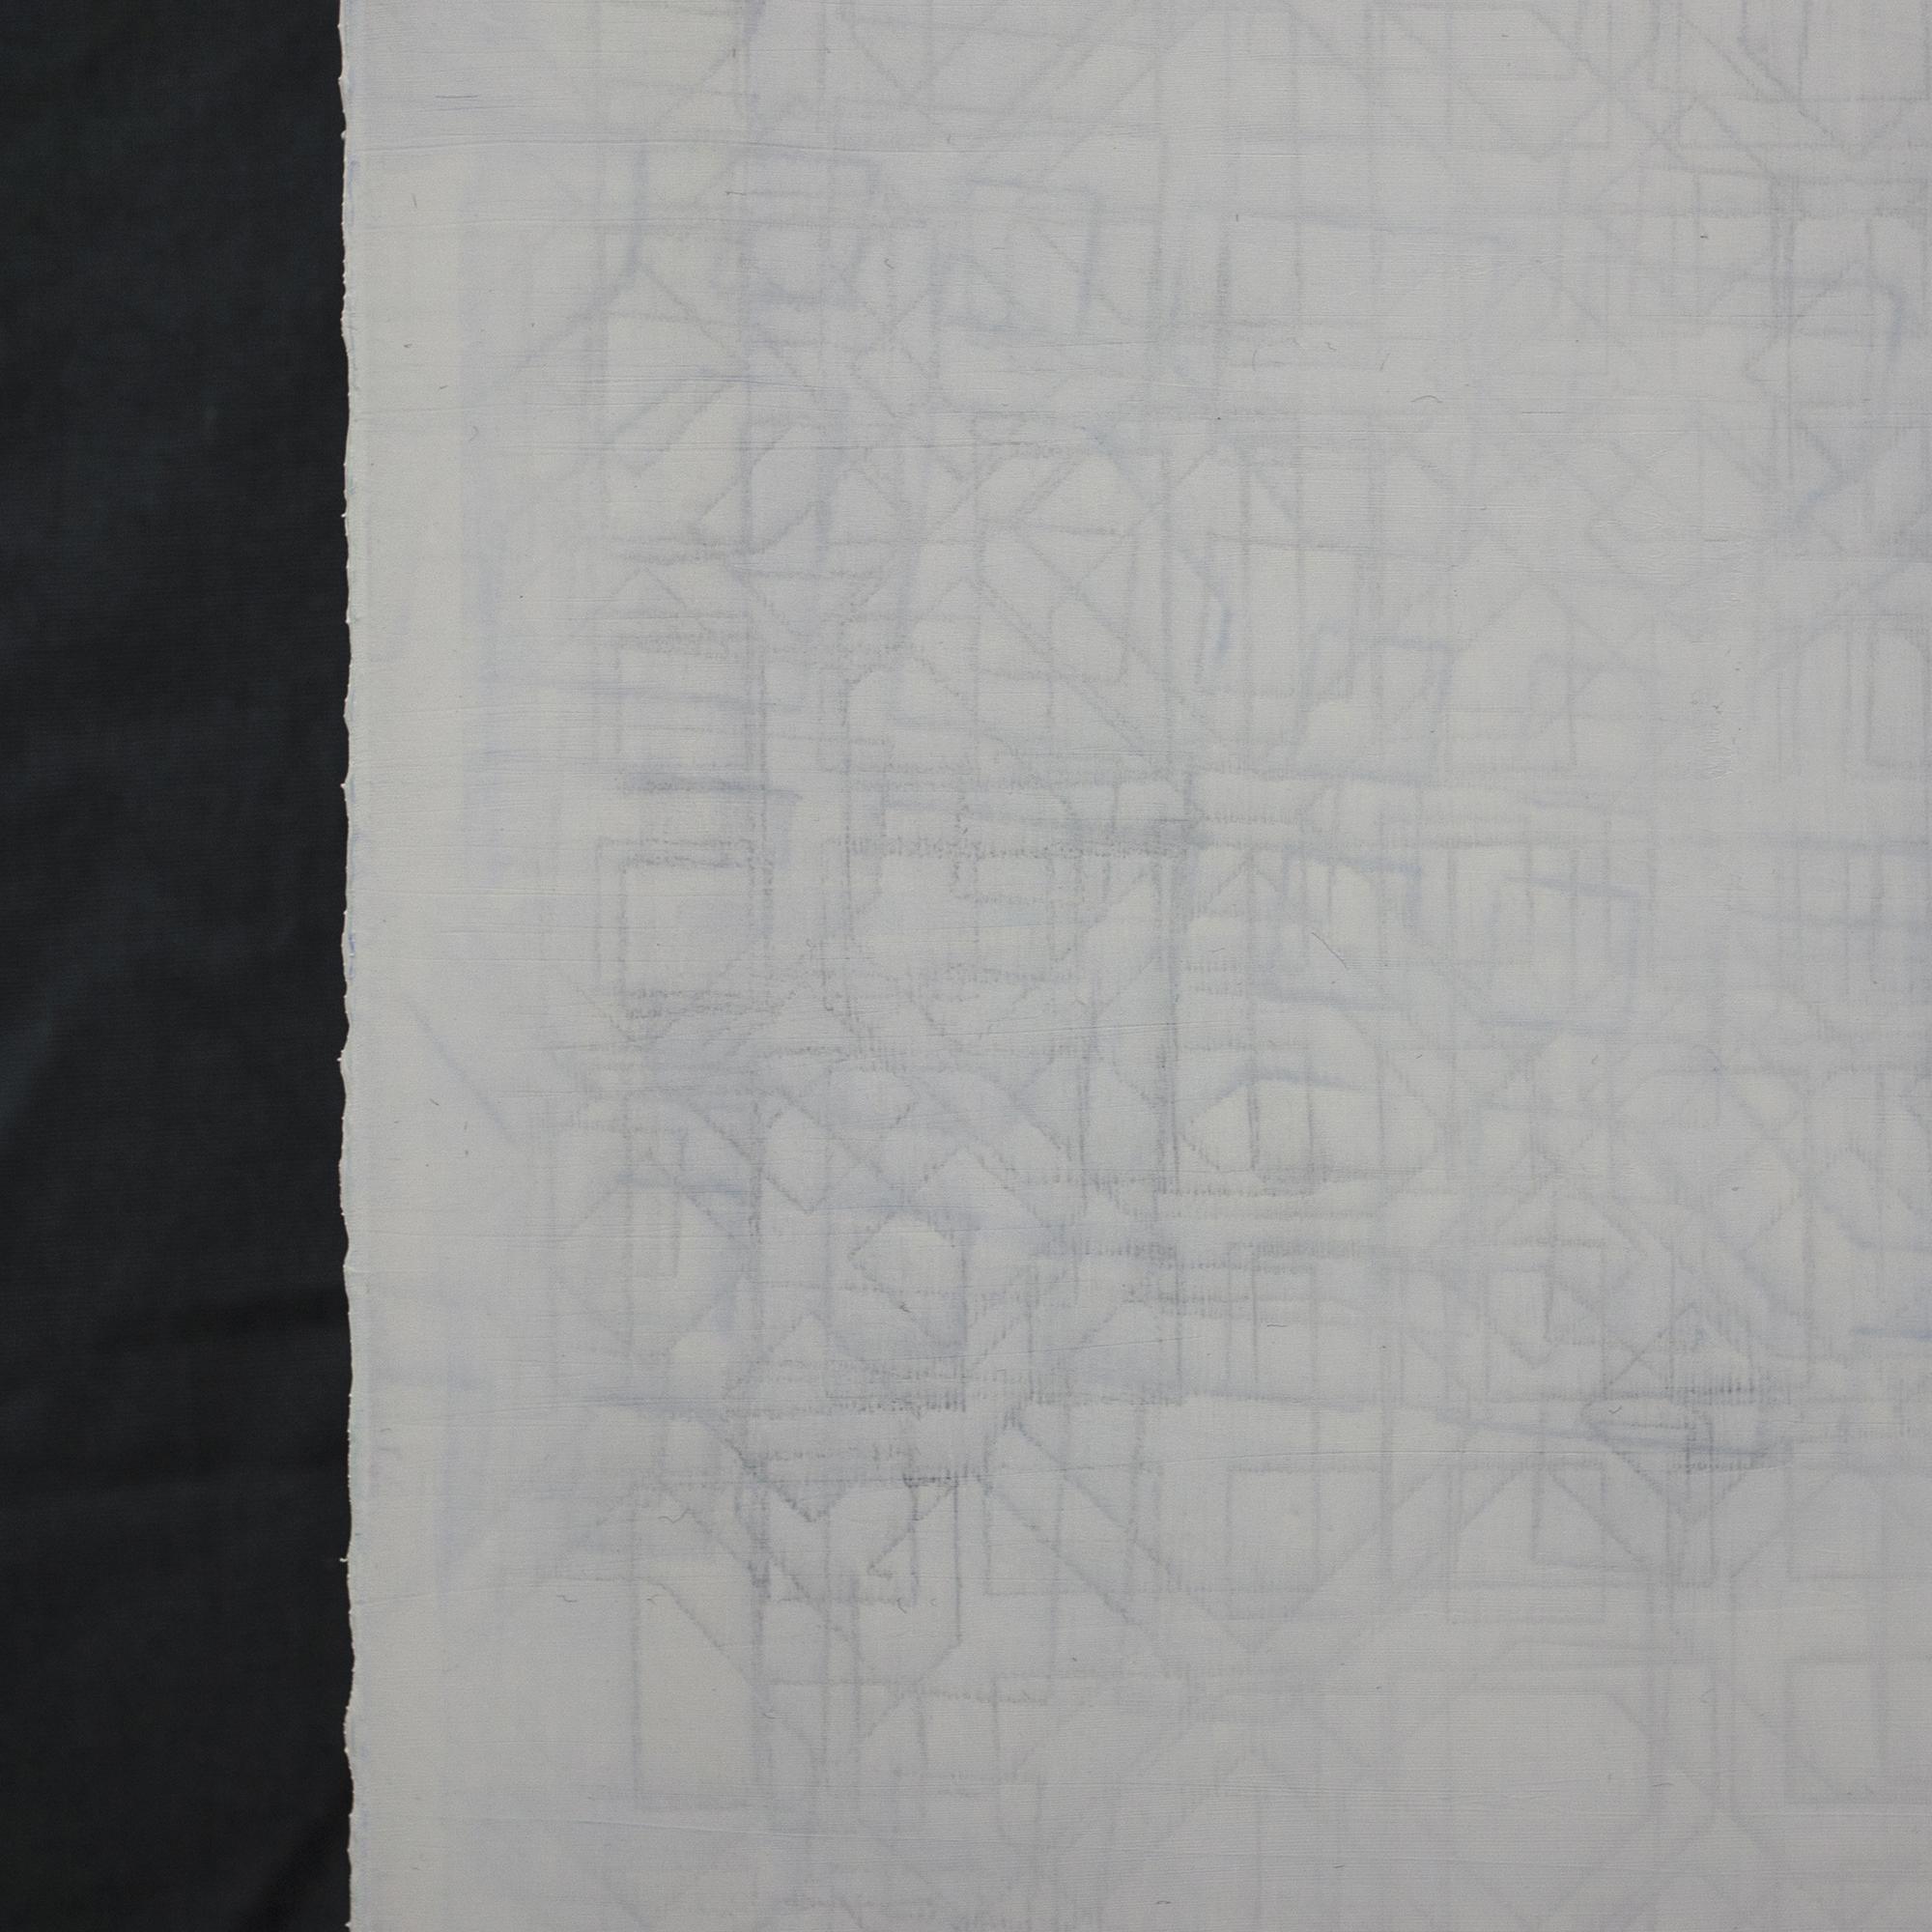 Detail (1 x 10 - 10)